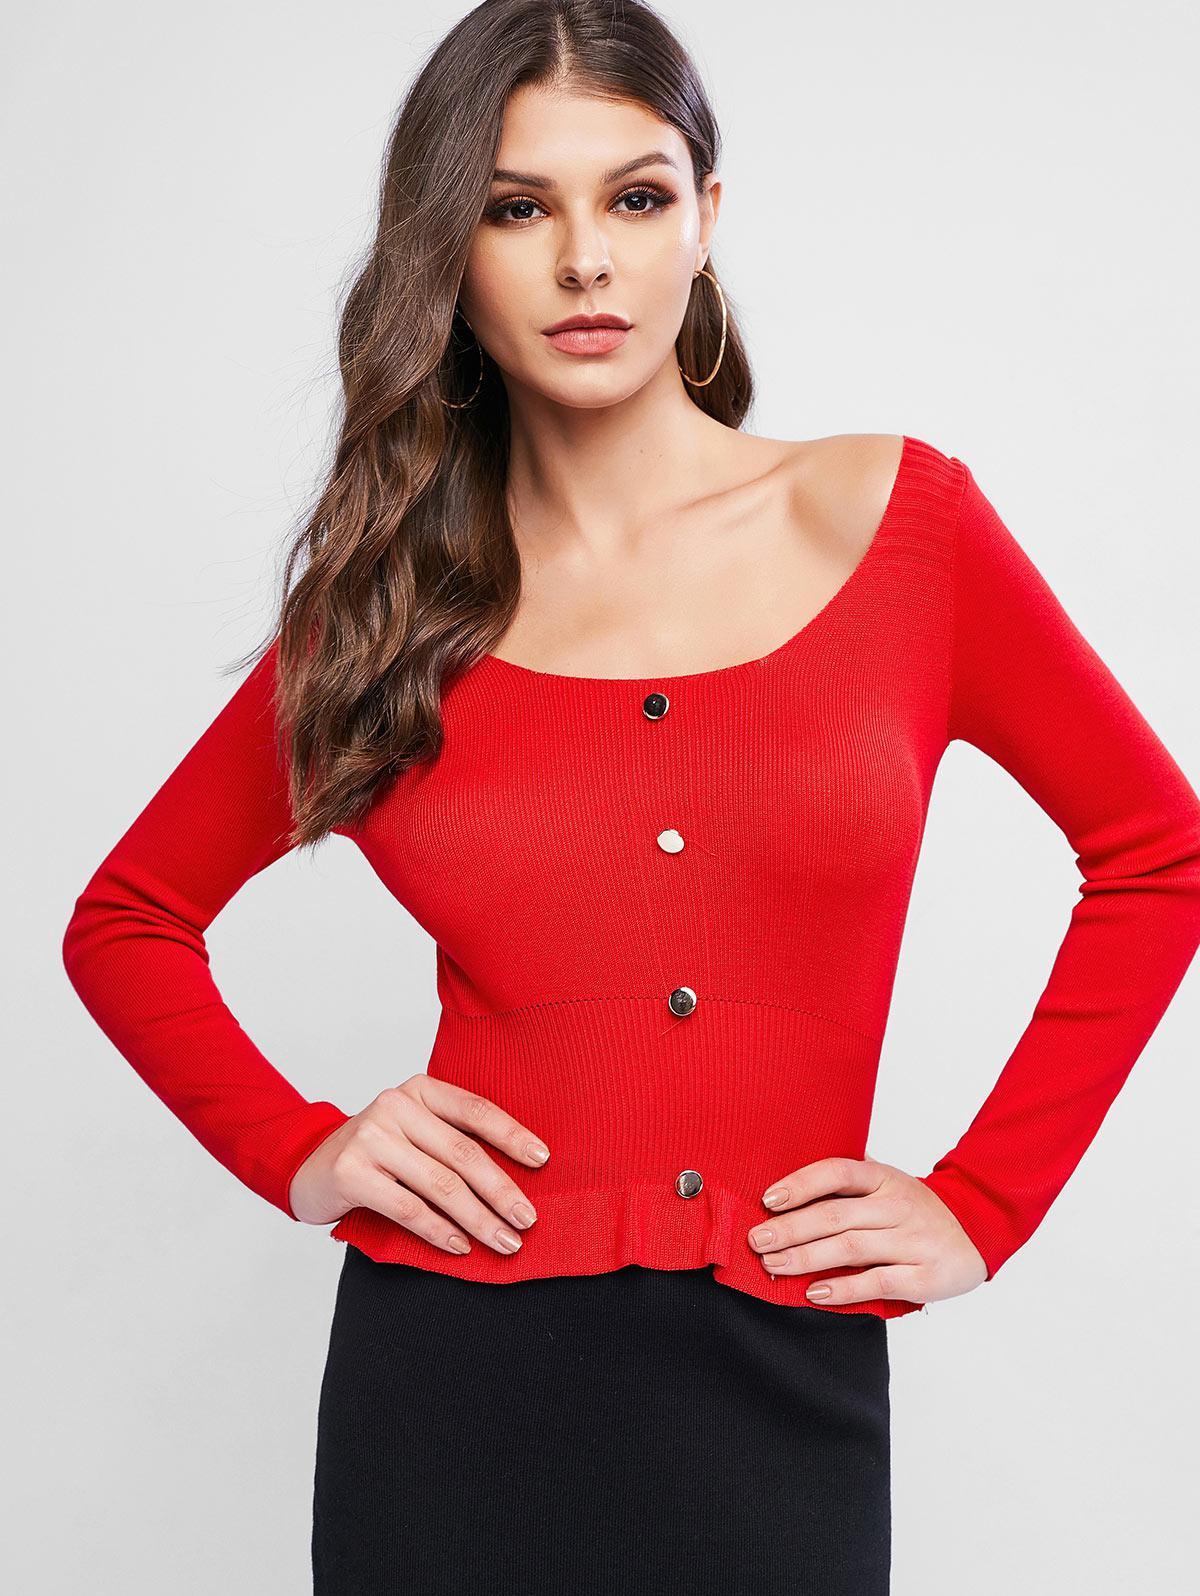 Scoop Neck Button Embellished Peplum Sweater